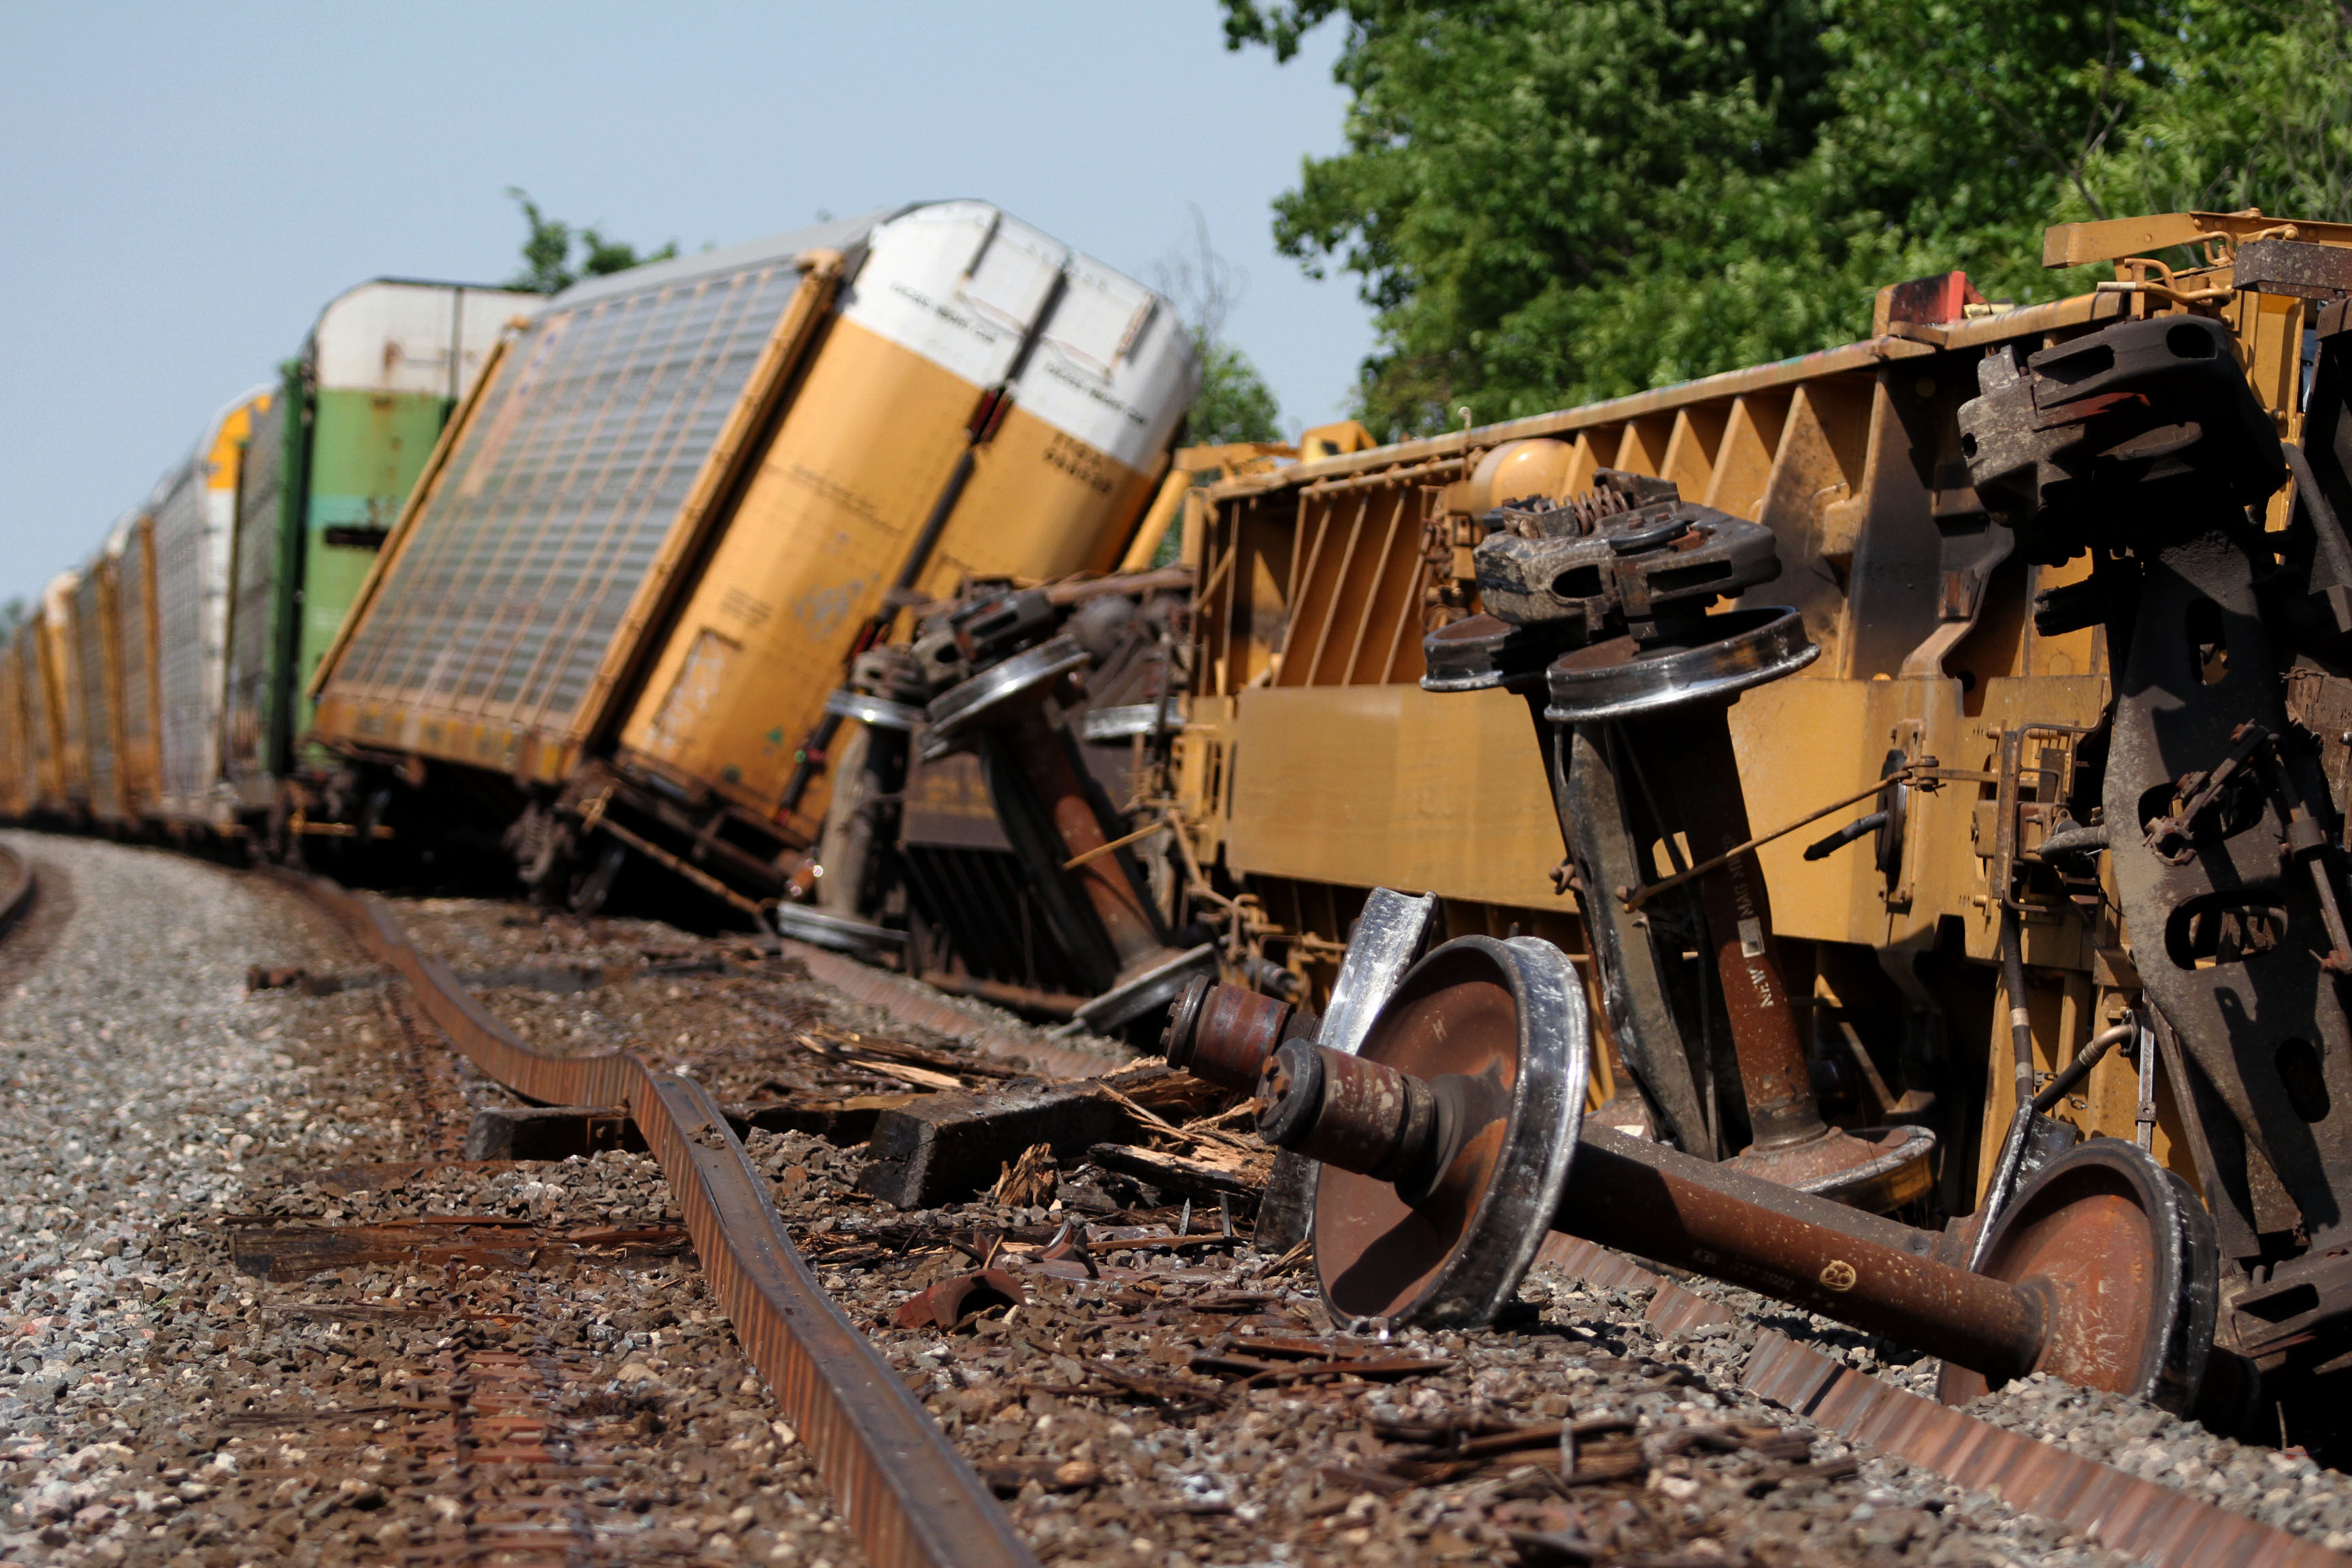 Train Derails Near Crestline Crawford County Now